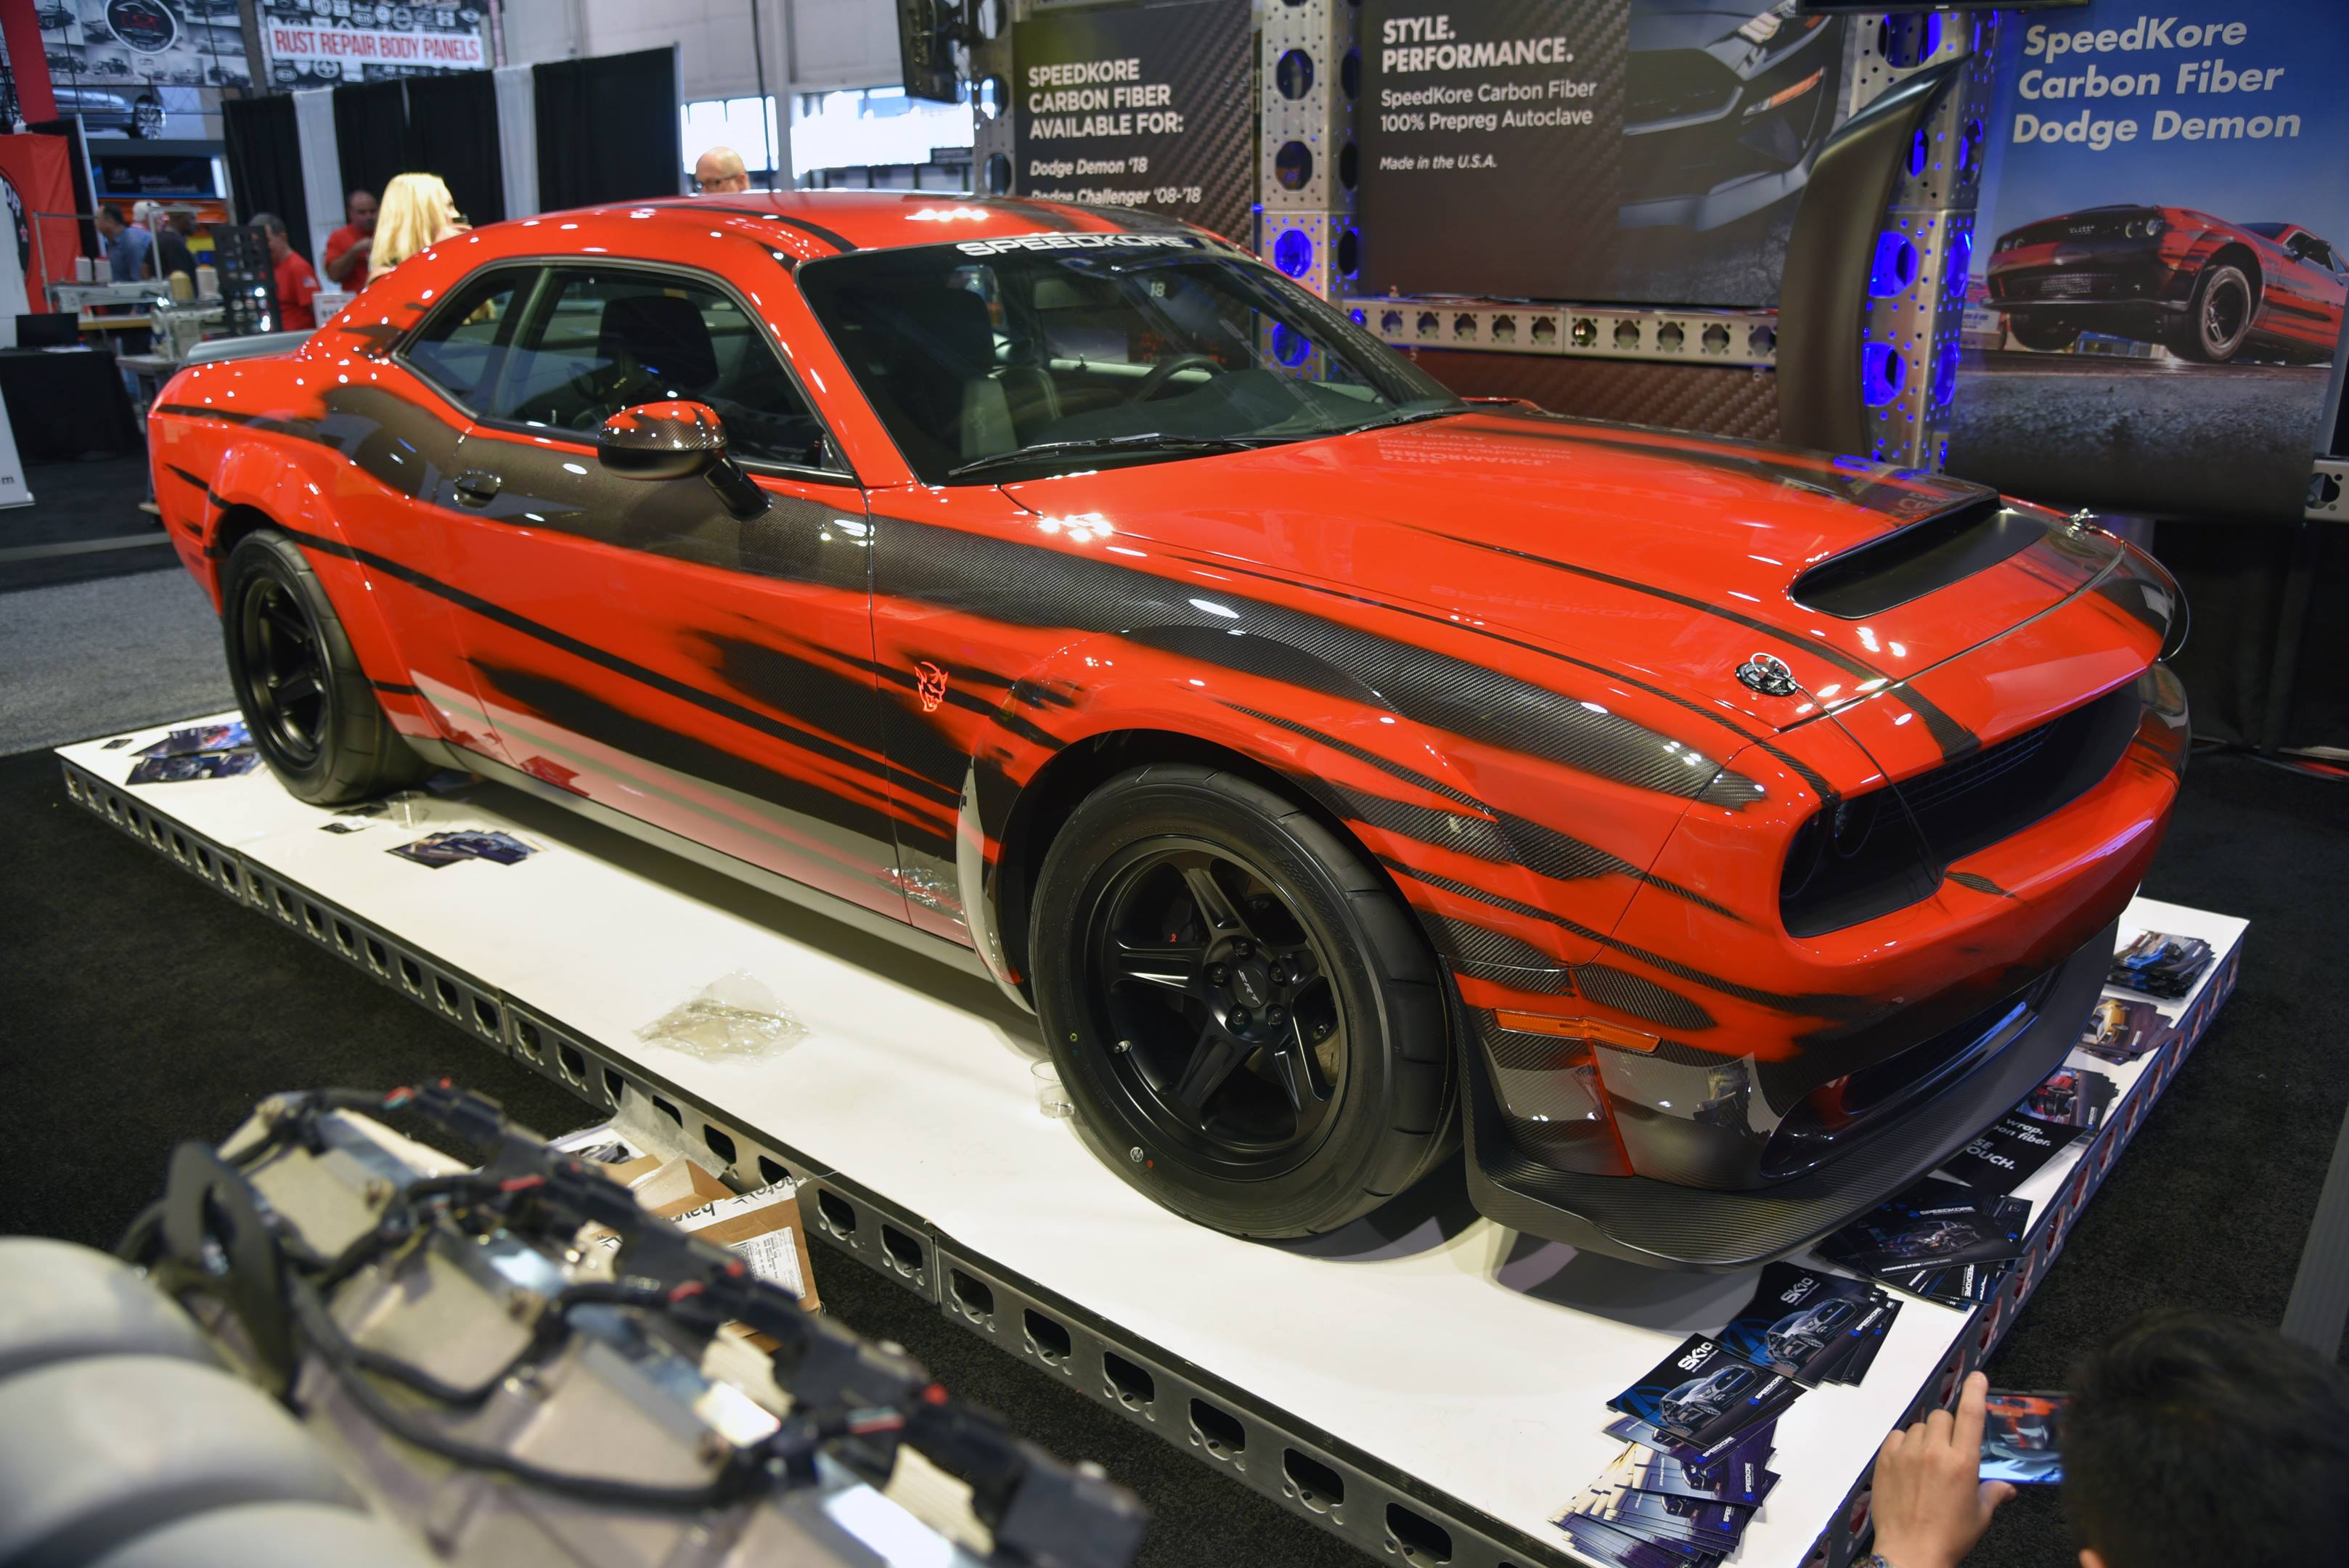 SpeedKore's carbonized Dodge Demon thumbnail